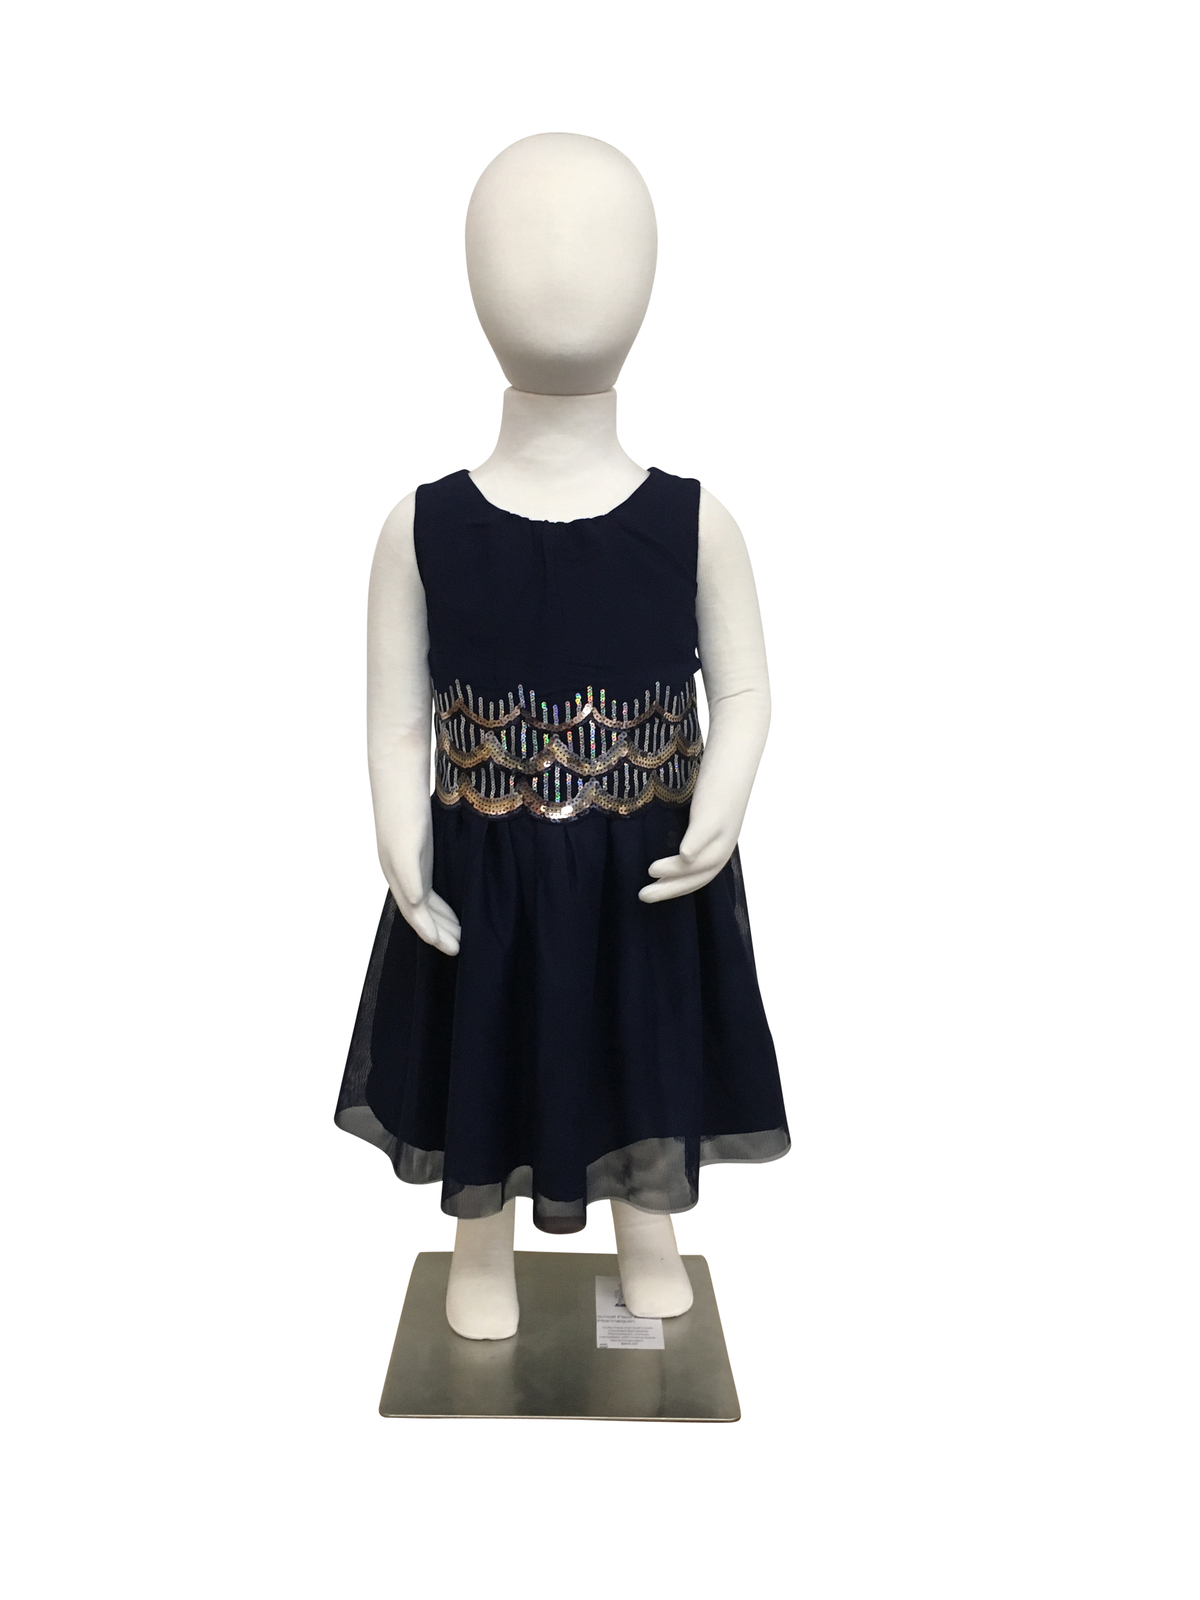 Medium Child Flexible Mannequin Full Body Standing With